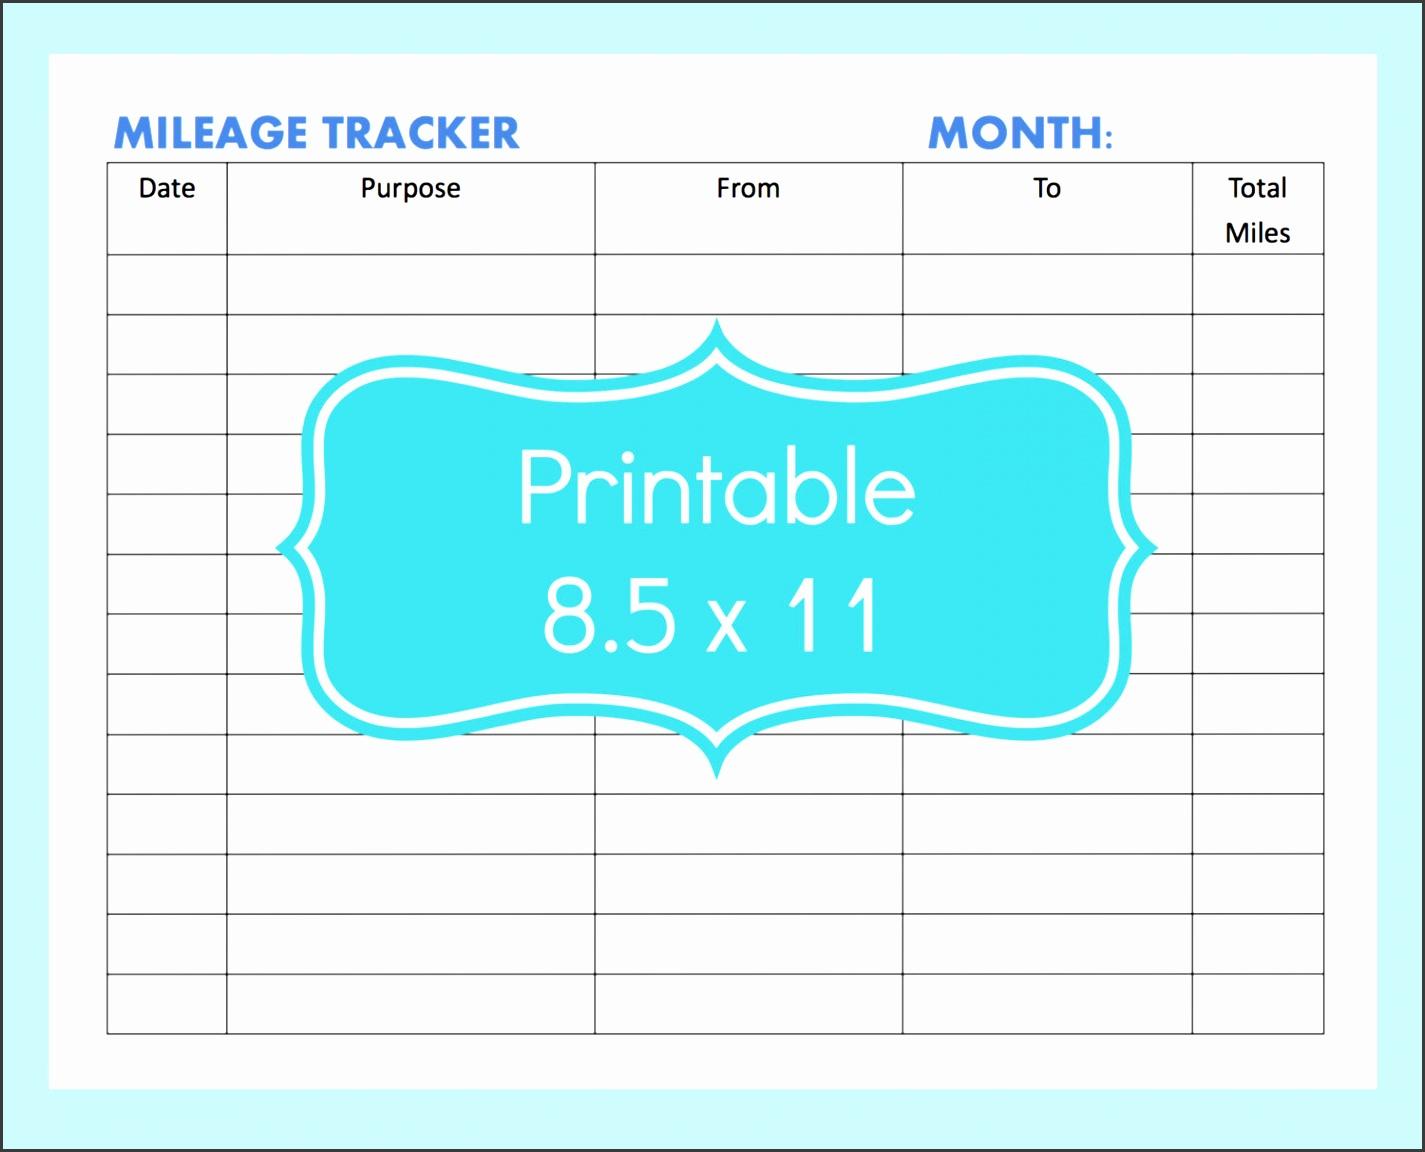 mileage tracker form printable